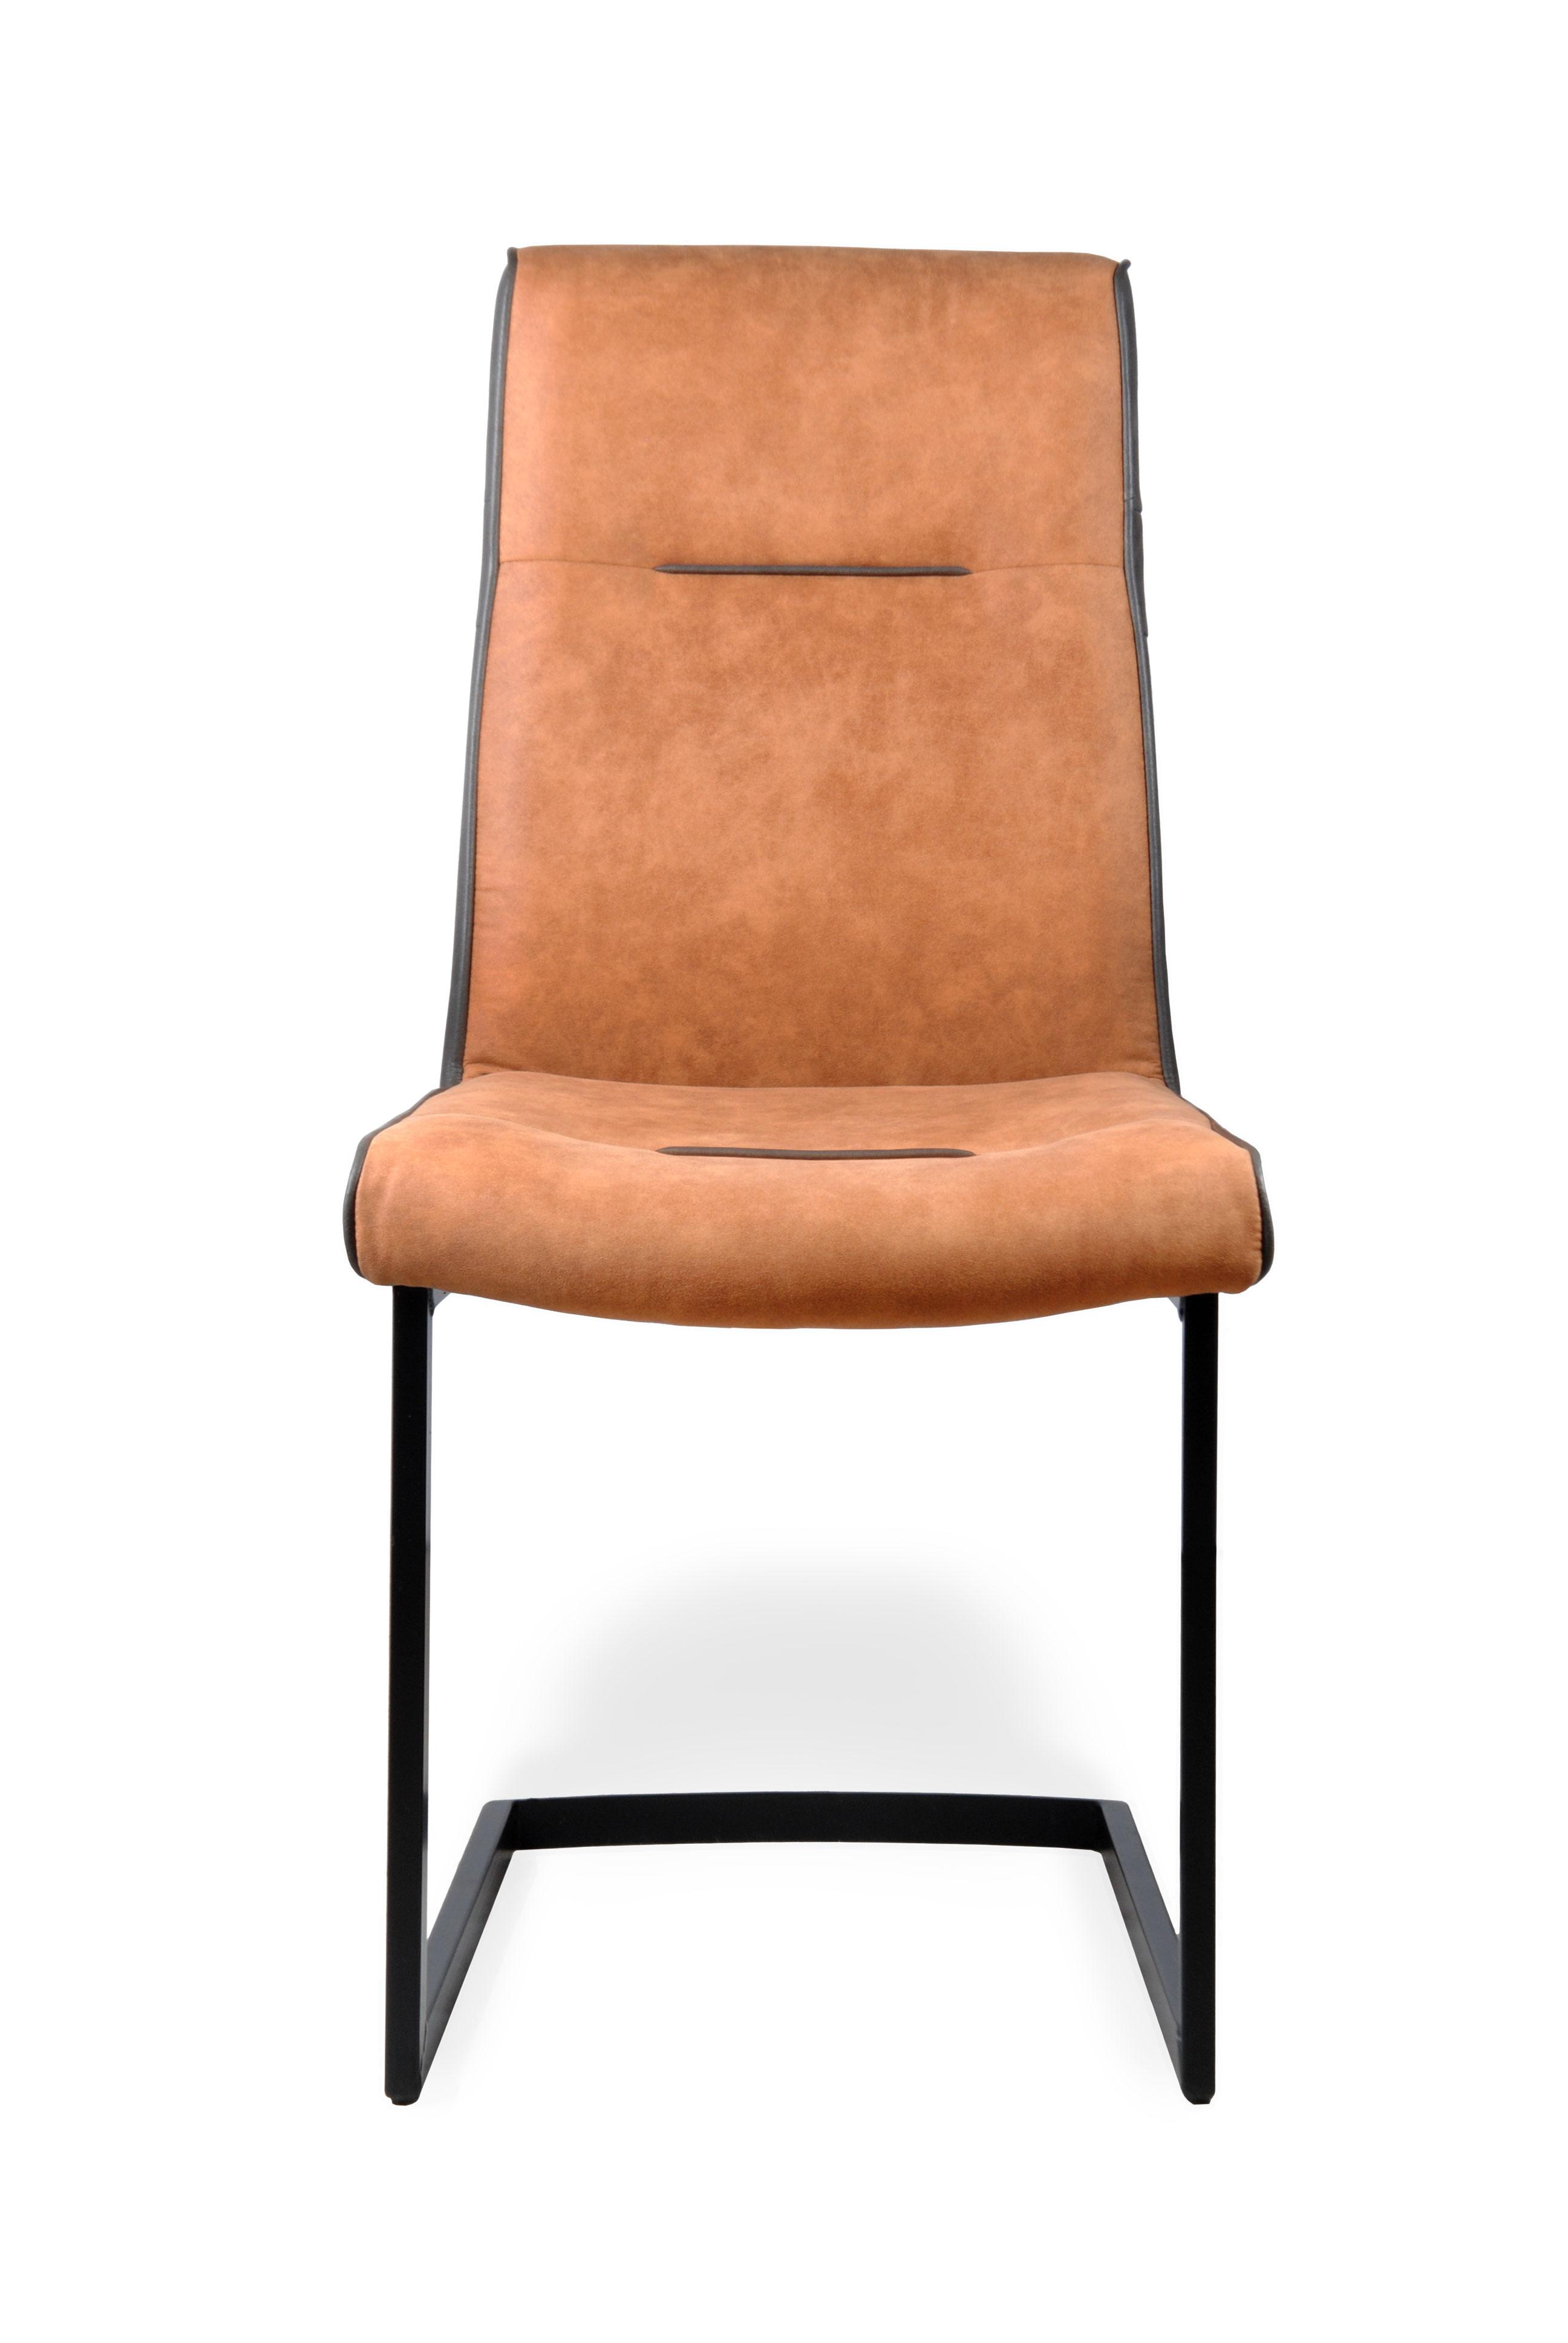 Iron_cover-Preston-24_backrest_Vintage-104_Base-black-(f-m-c)